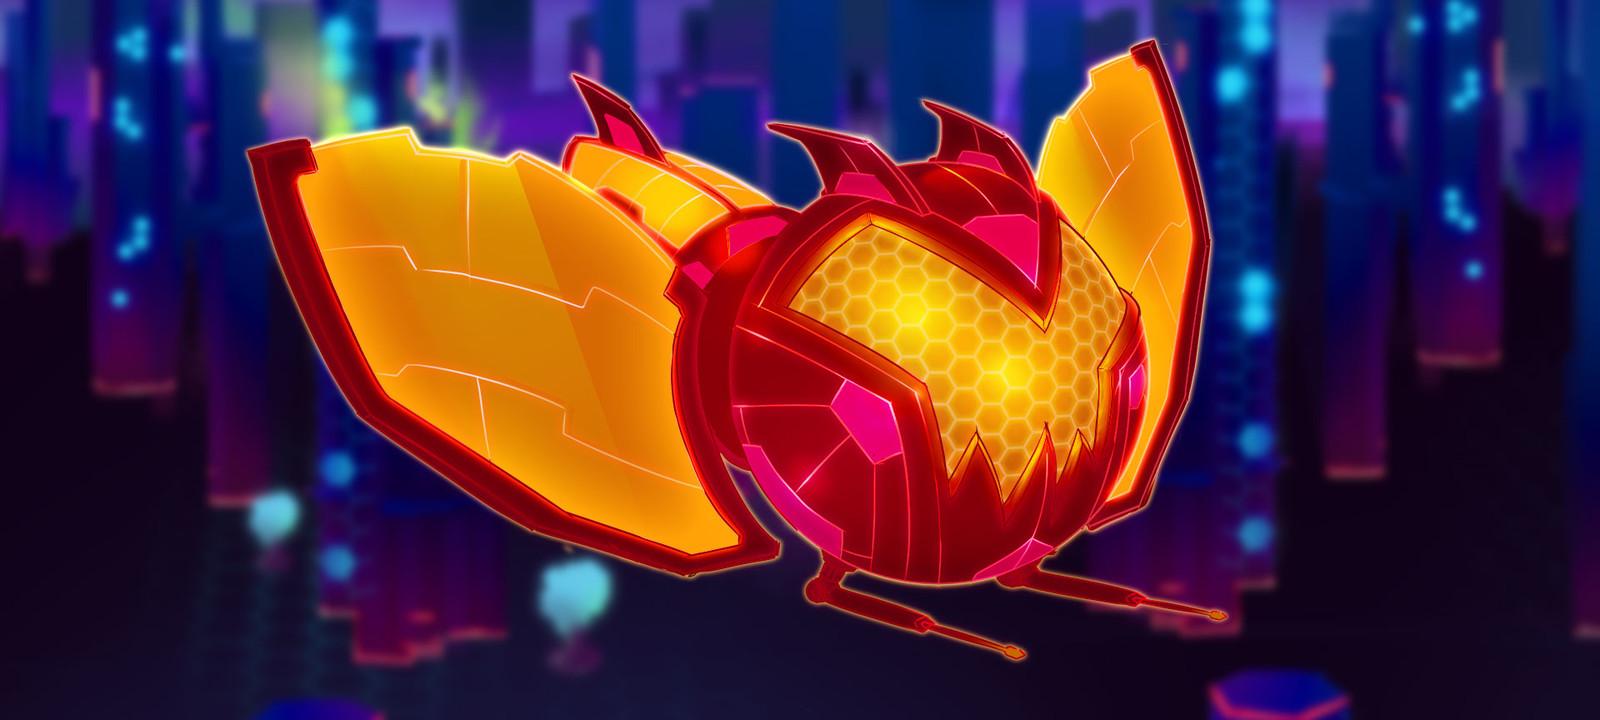 Final Fire Element Unit, The Firefly.